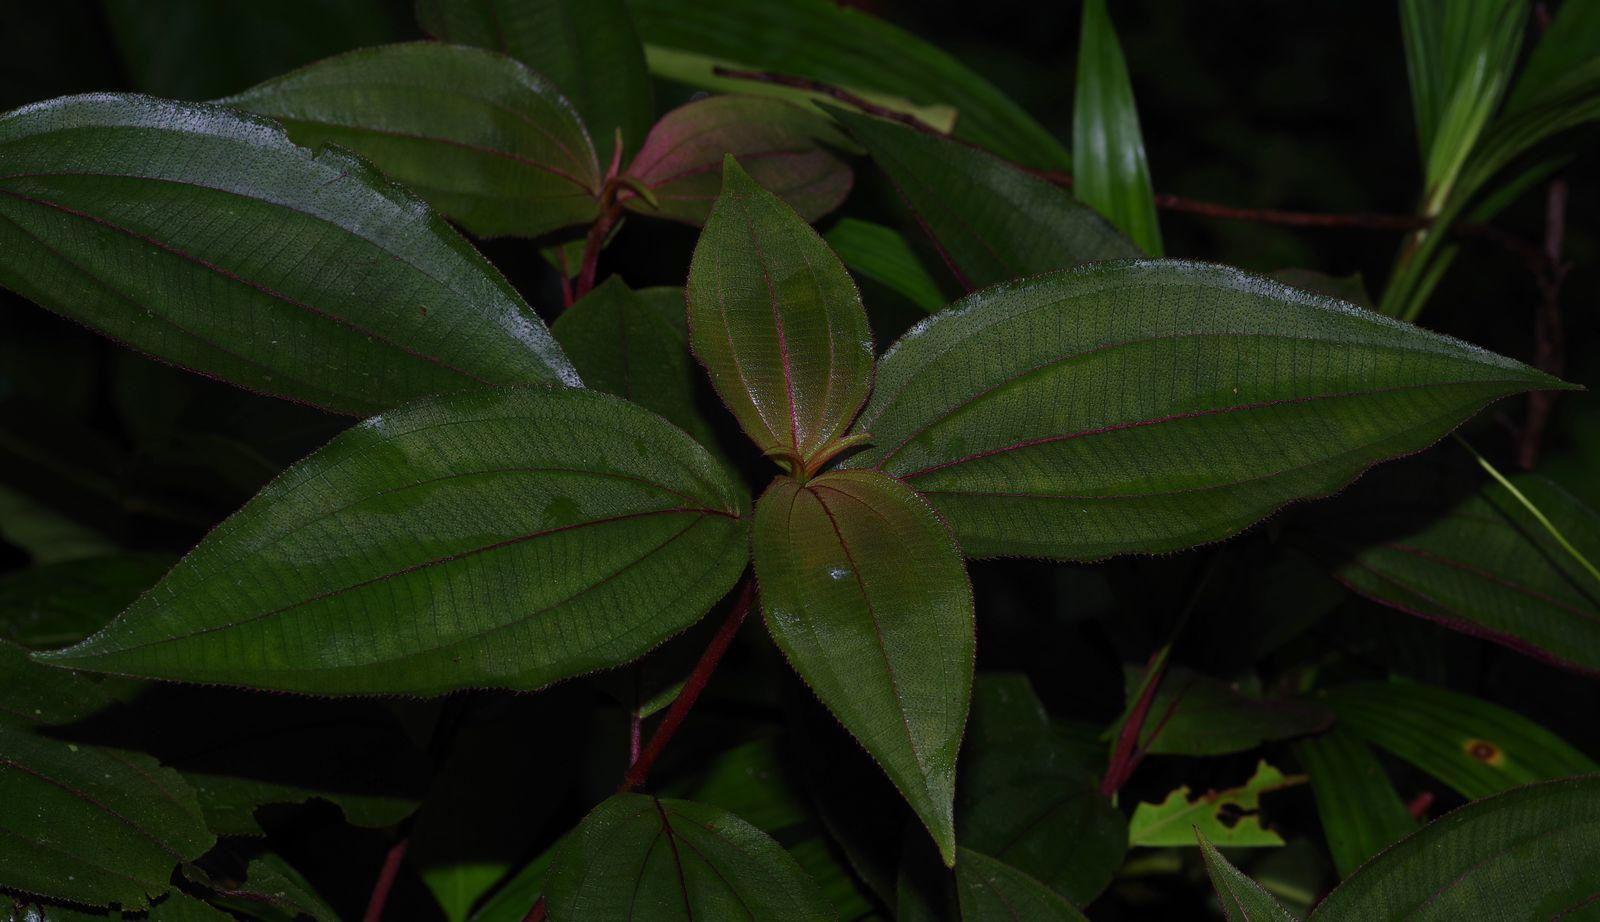 Miconia ceramicarpa var. ceramicarpa